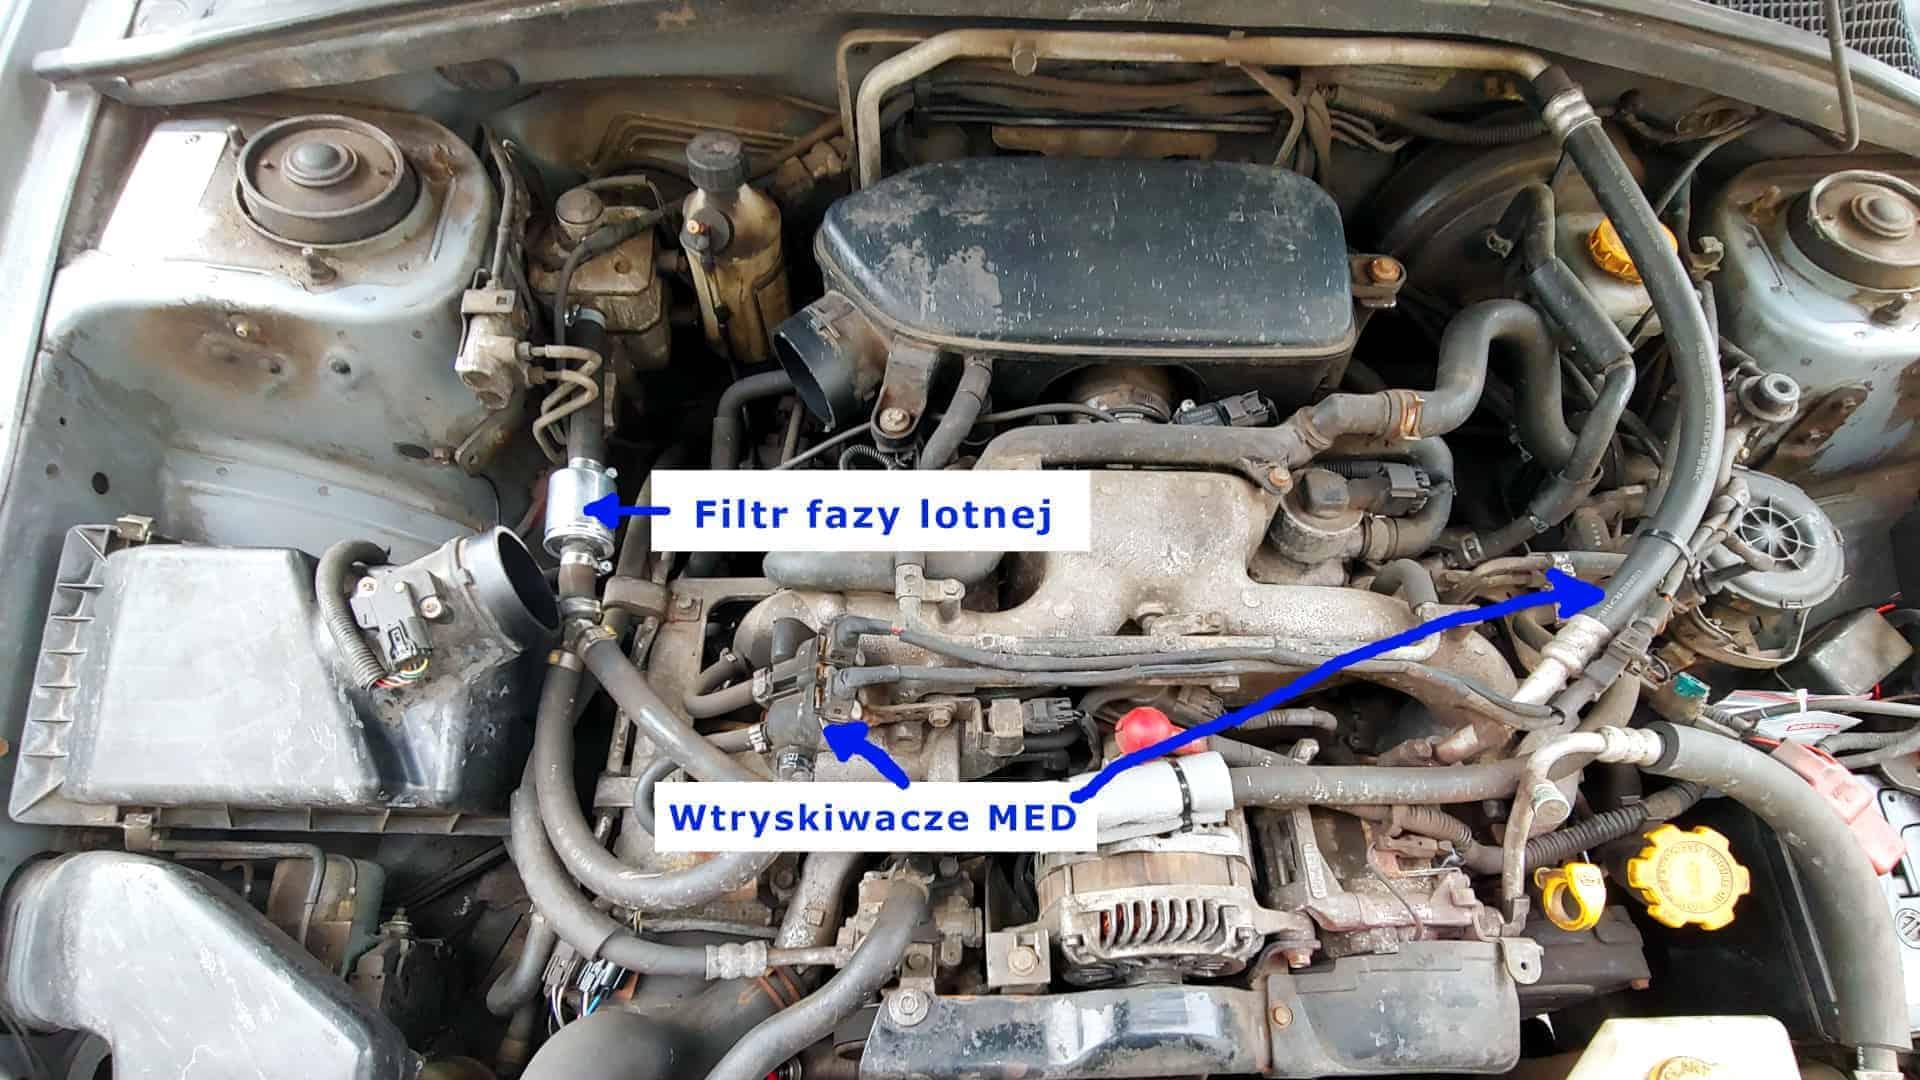 Stare wtryskiwacze MED w Subaru Forester